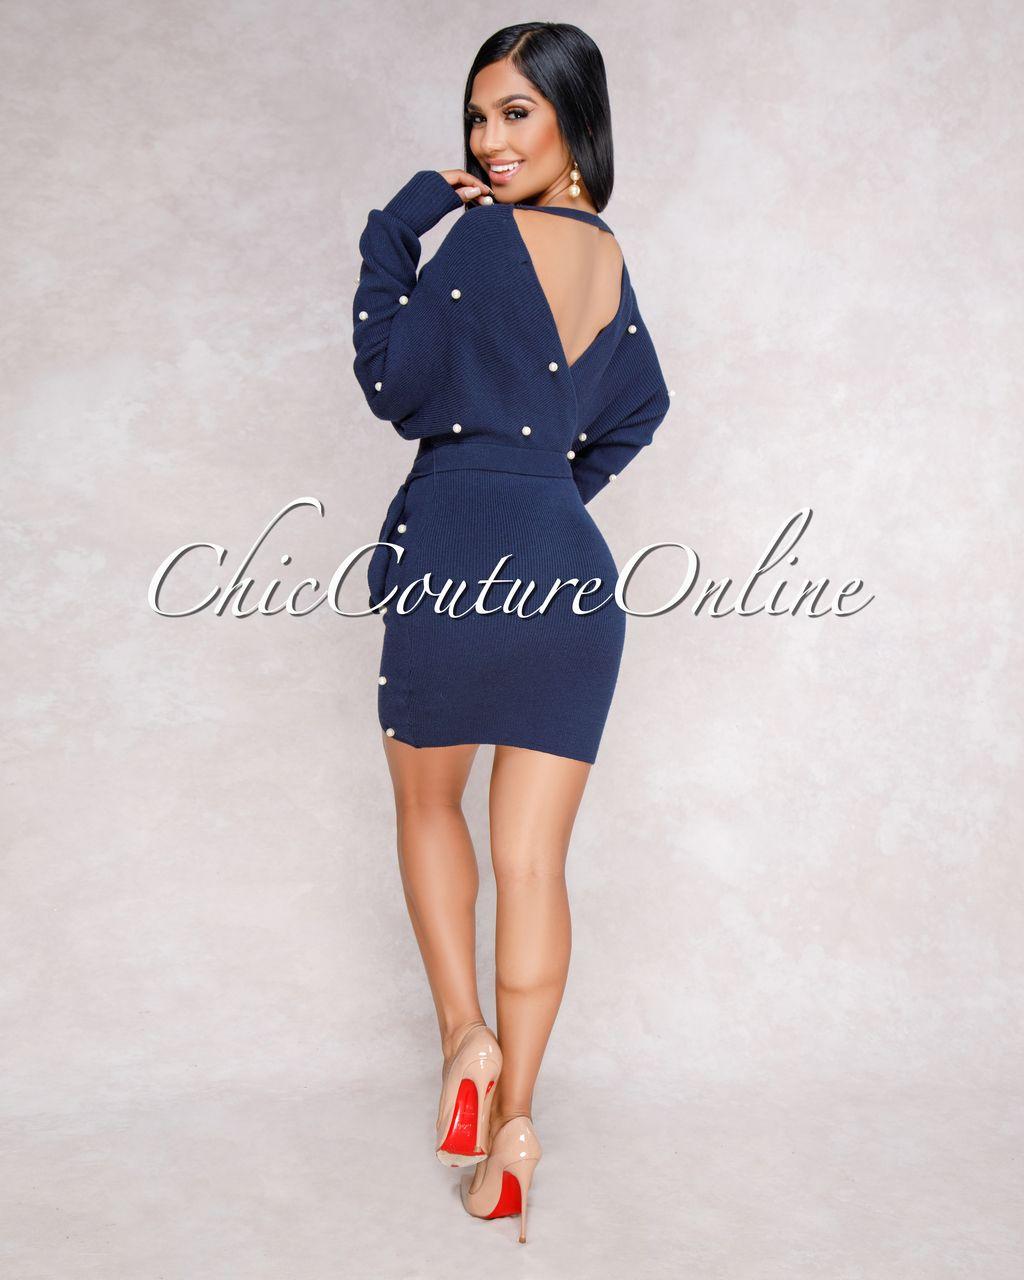 4d1213ab0dfe3 Tricot Robe Pull, Perle Bleue, Robe Moulante Flamboyante, Clubwear, Robe  Patineuse,